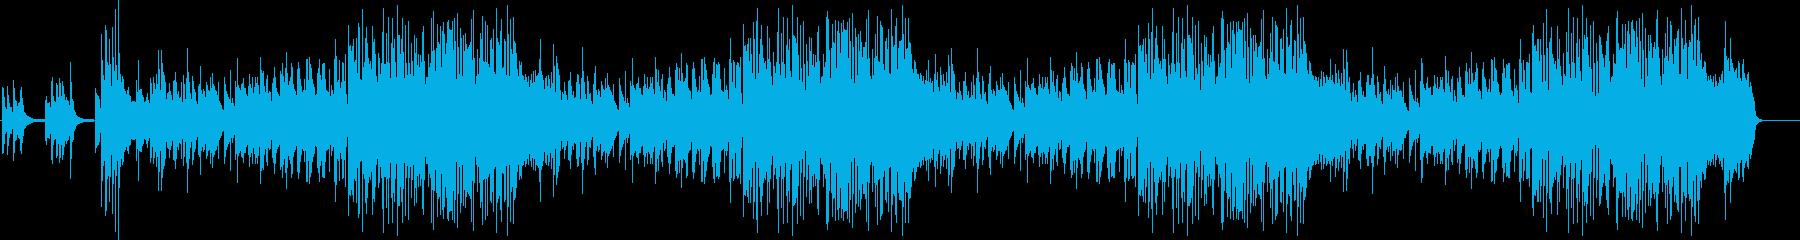 VTRやスライド、なれそめトークのBGMの再生済みの波形